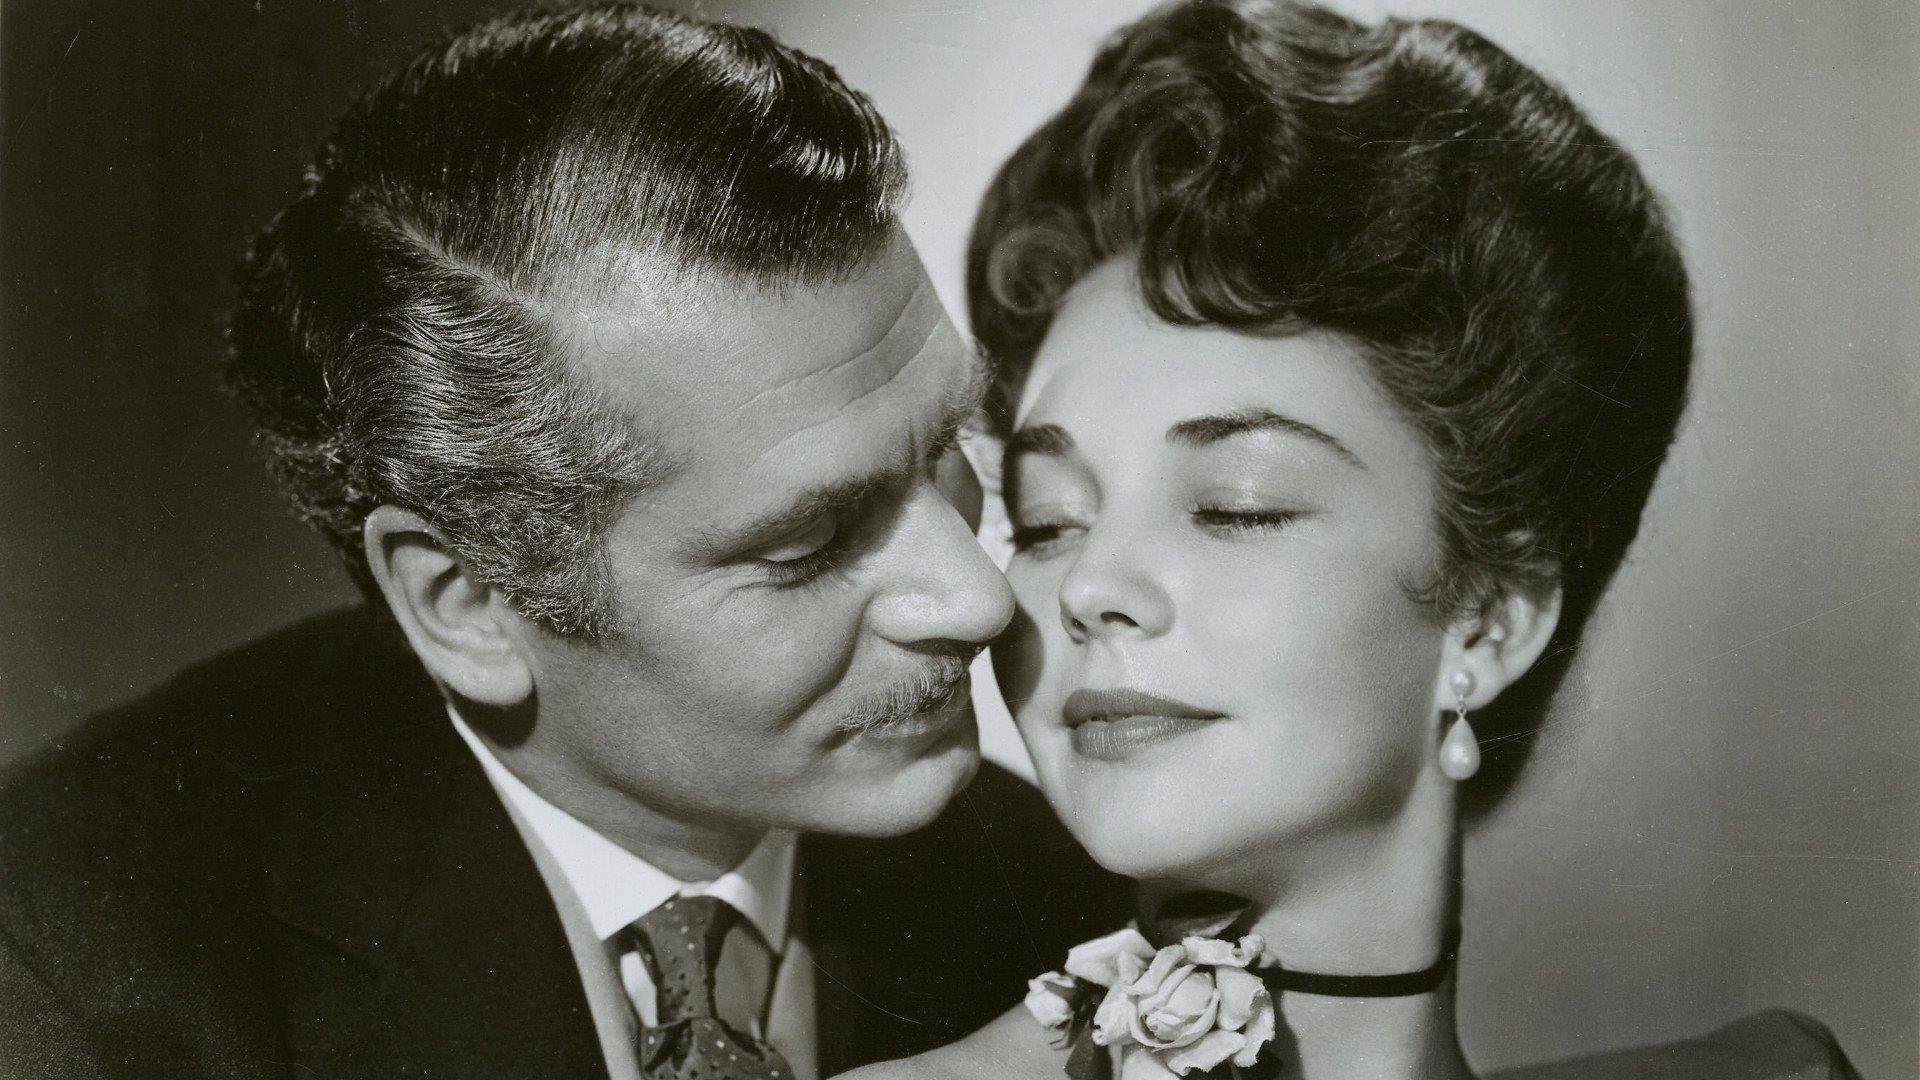 Sir Laurence Olivier & Jennifer Jones